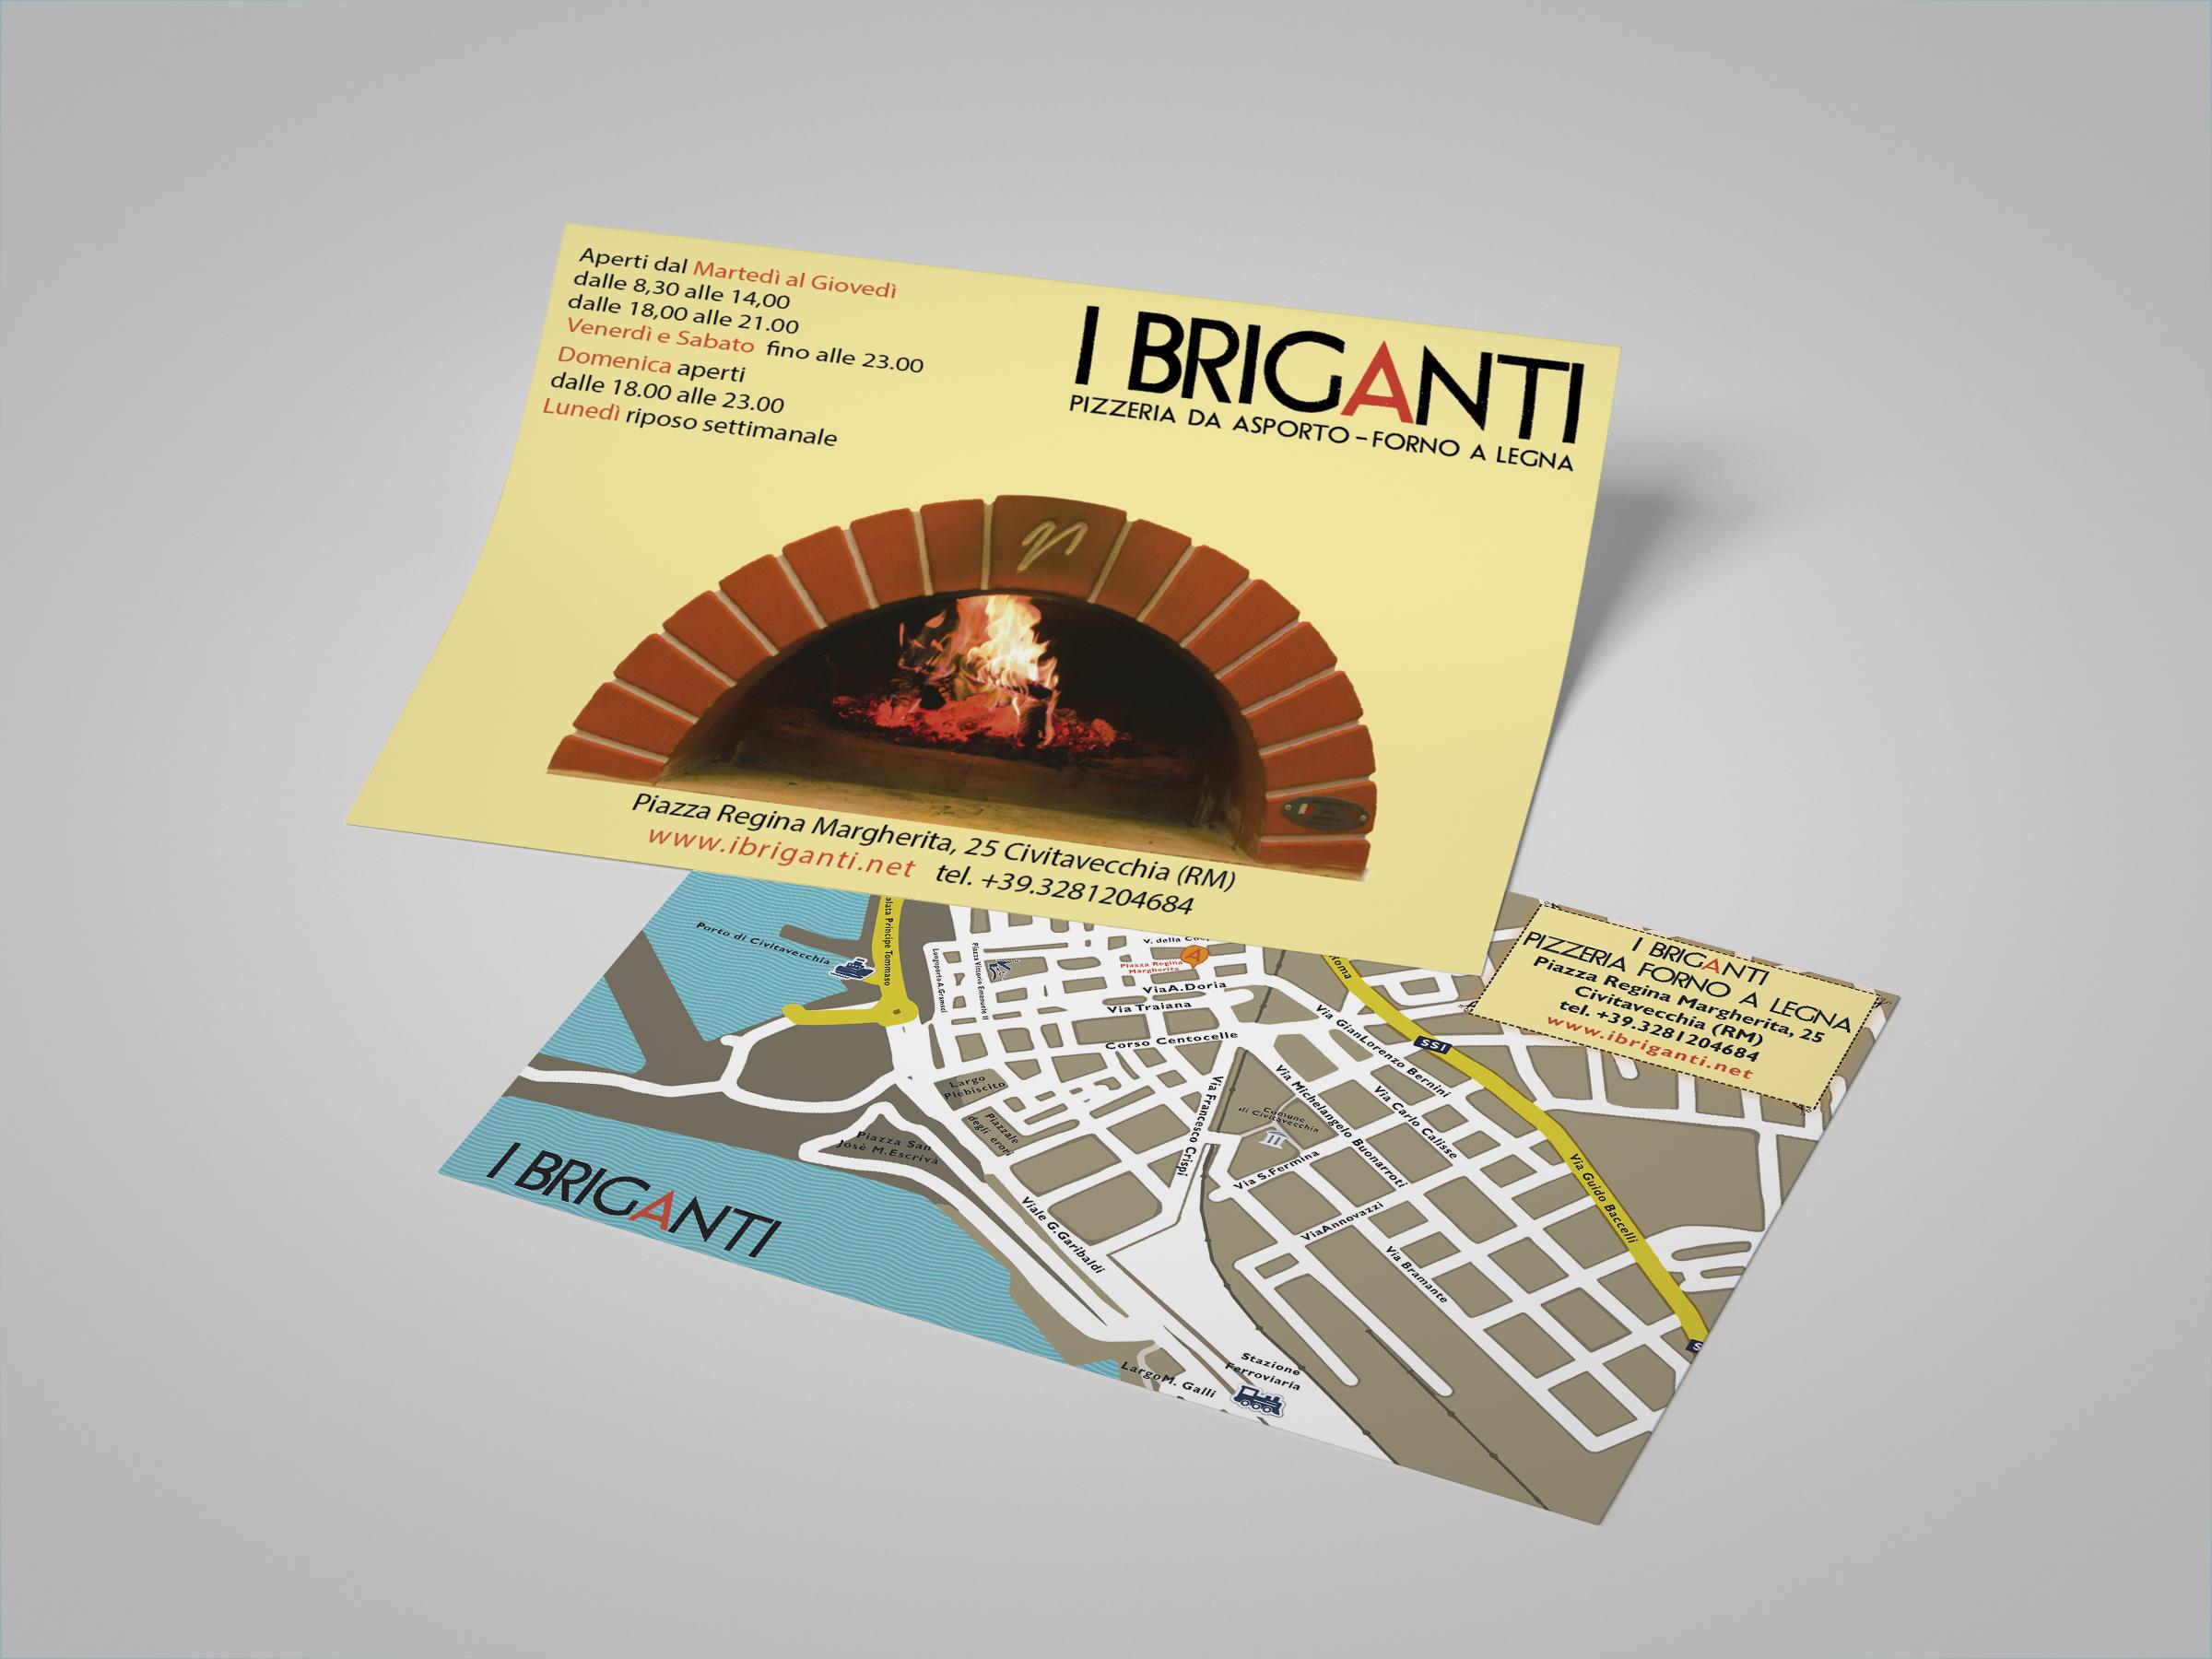 https://www.elisadellachiesa.it/wp-content/uploads/2020/01/I-Briganti-flyer.jpg